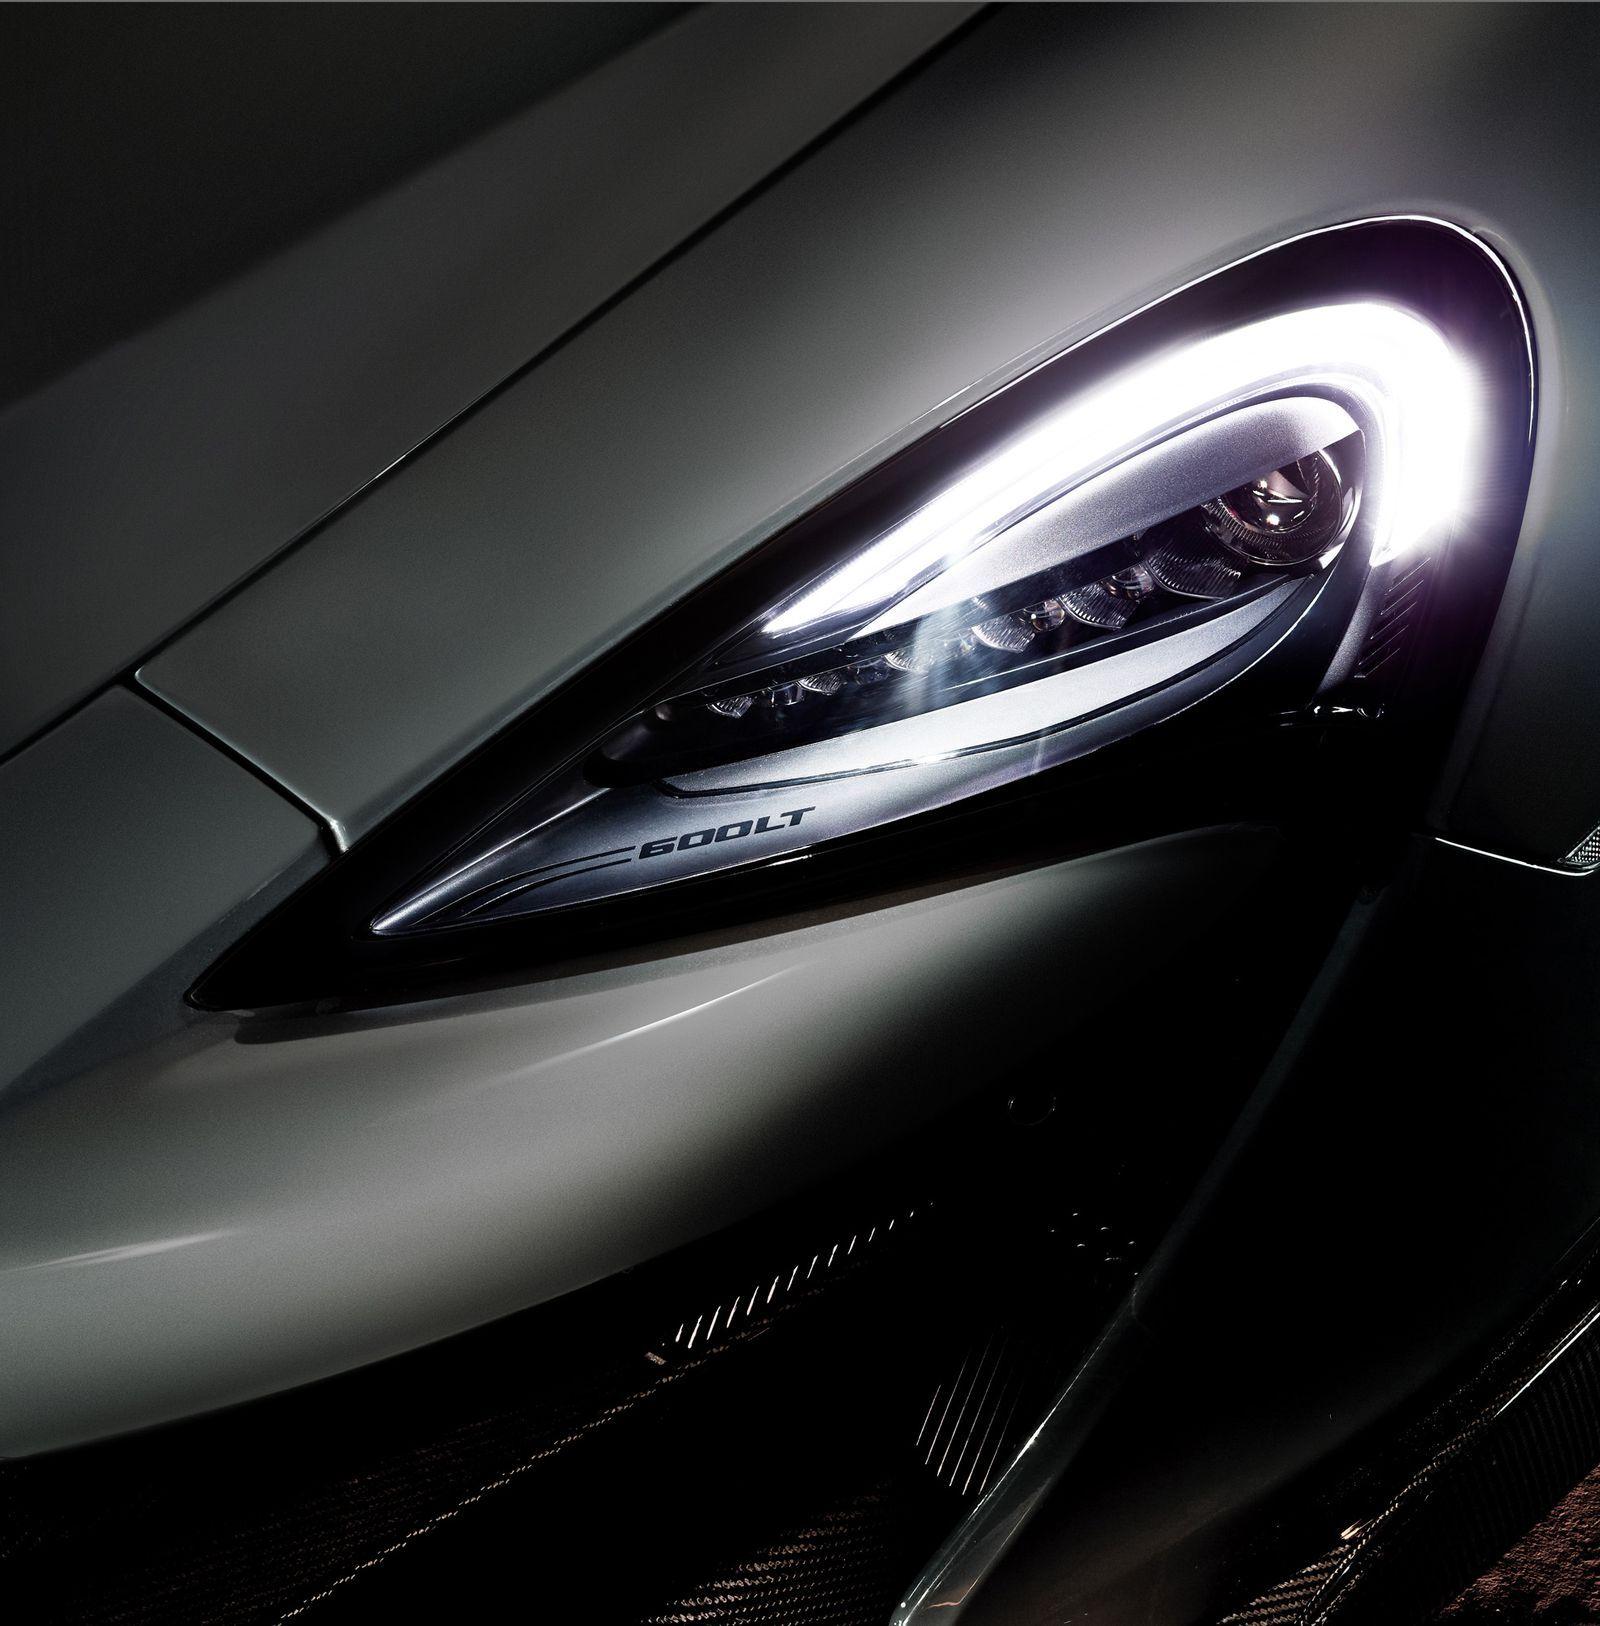 Mclaren 600lt Gallery Mclaren New Cars Super Cars